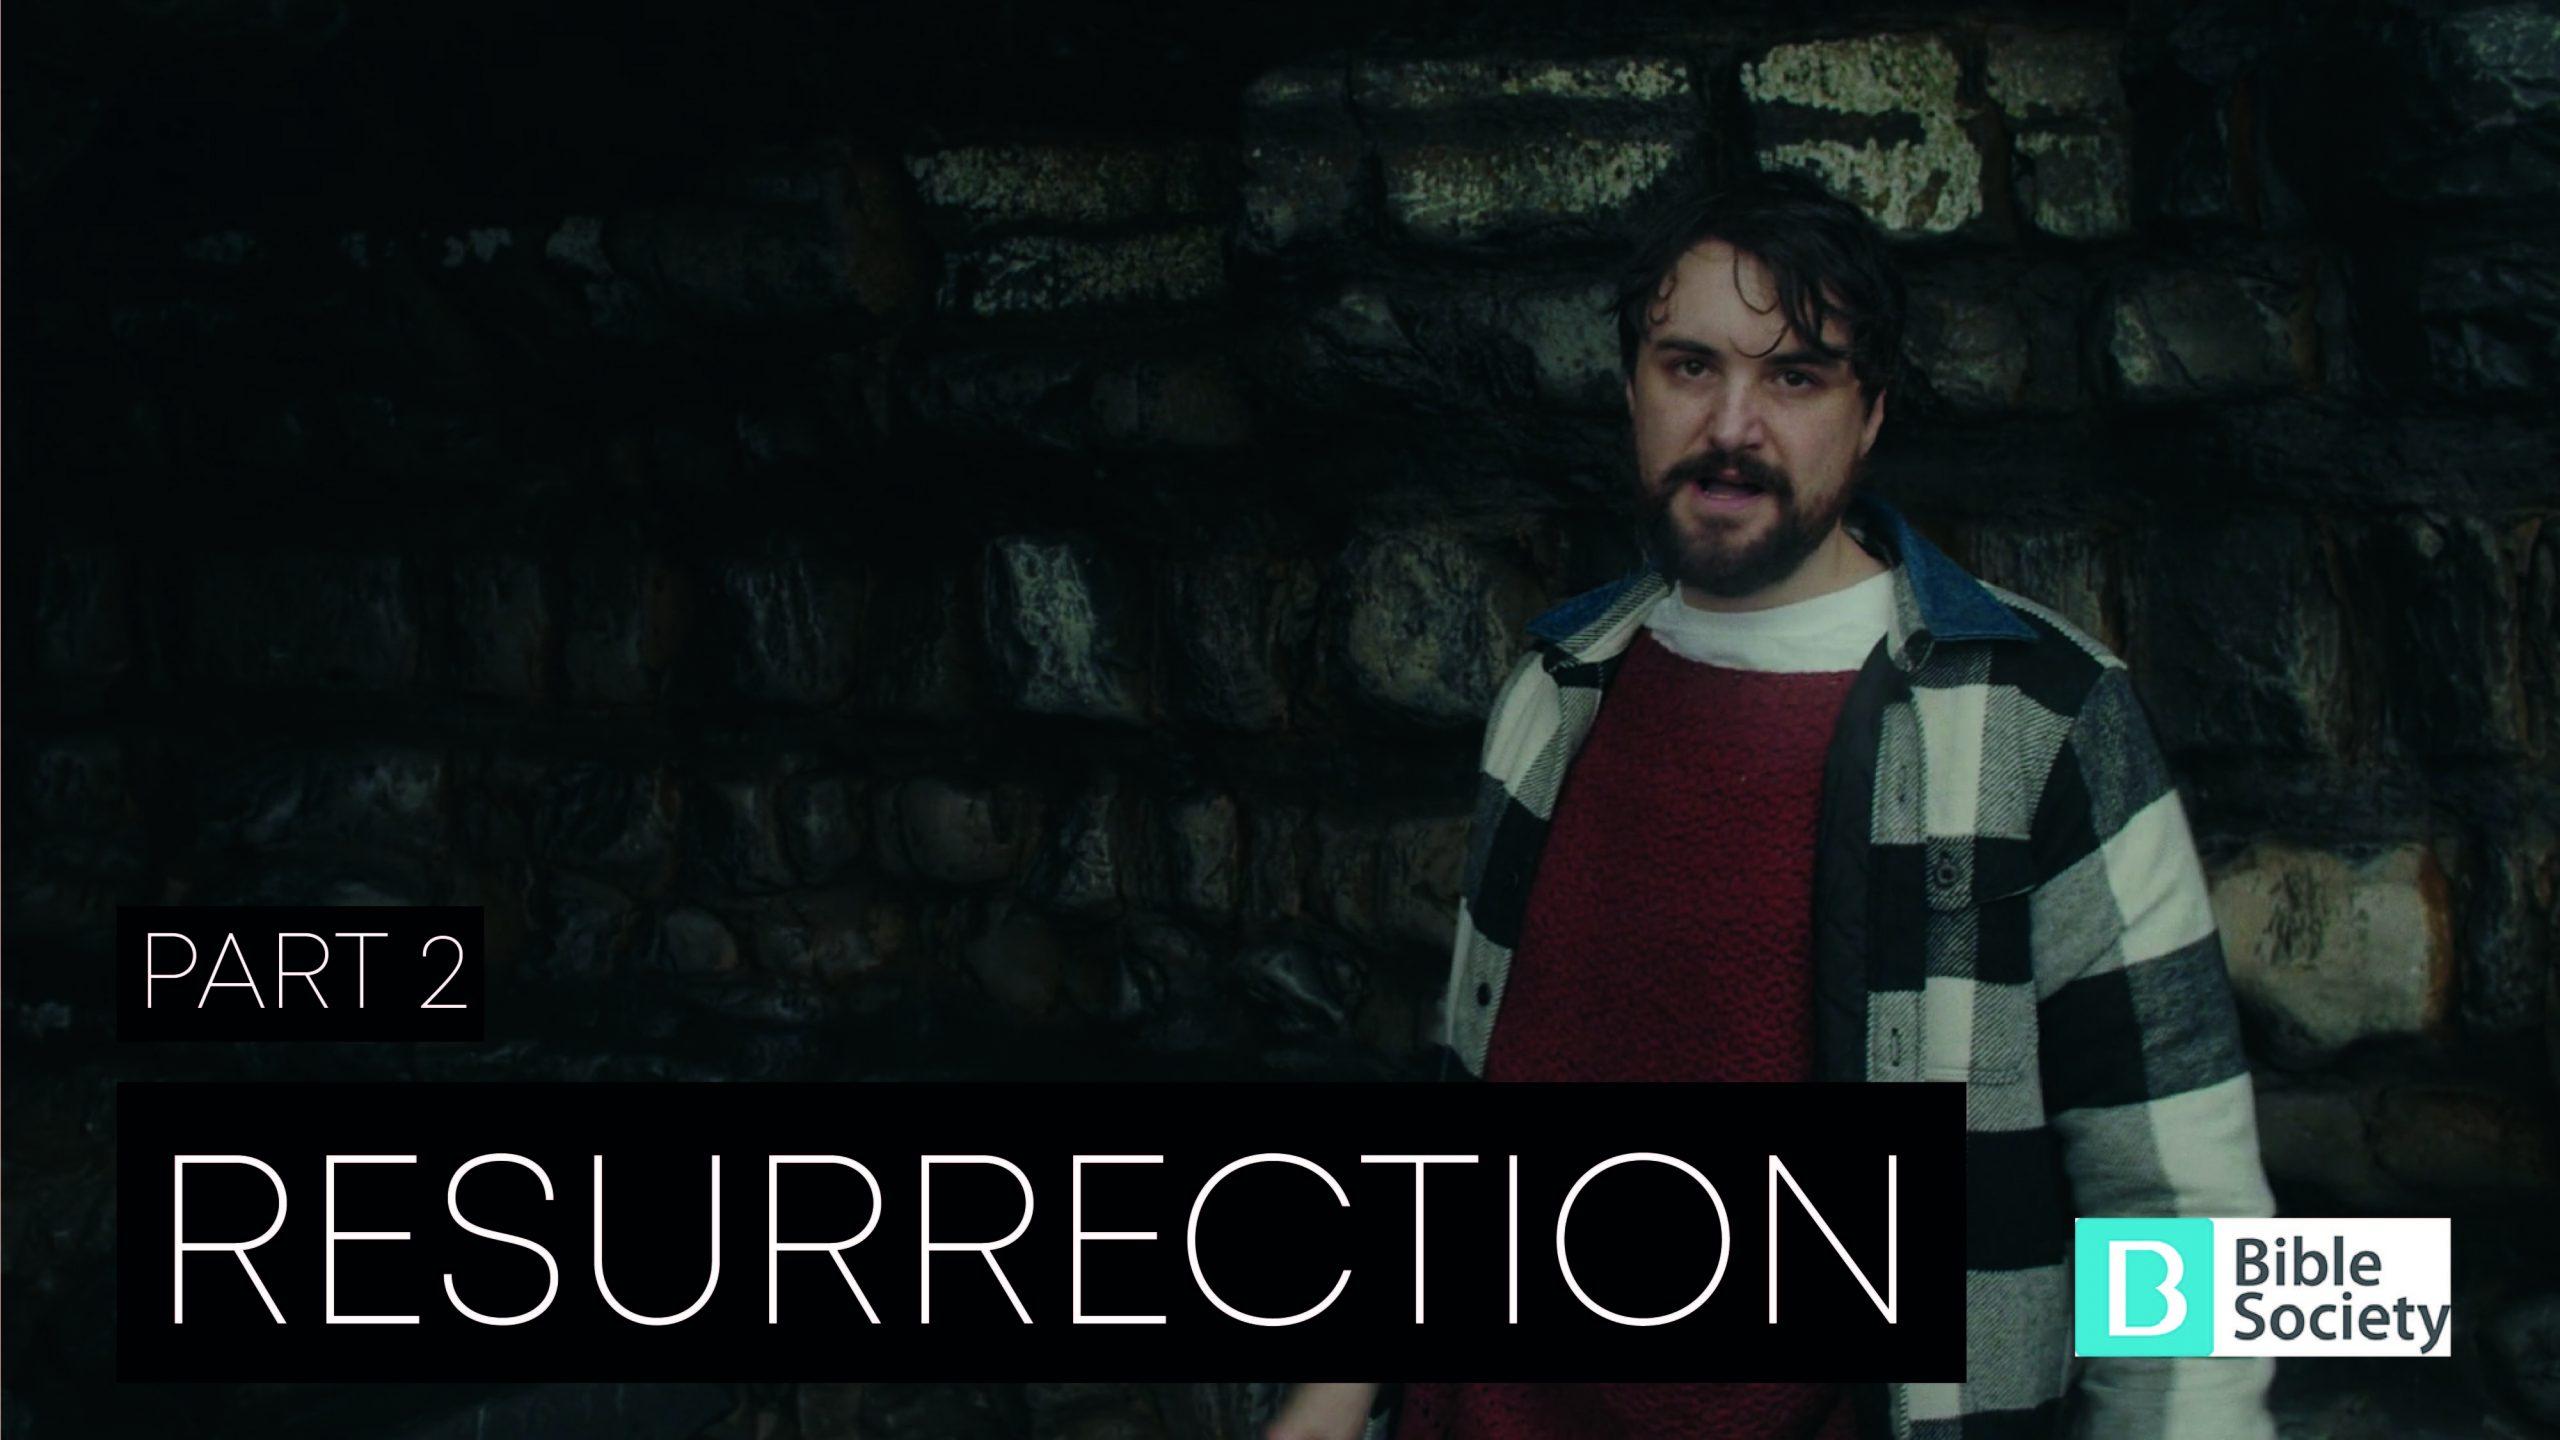 Part 2, Resurrection